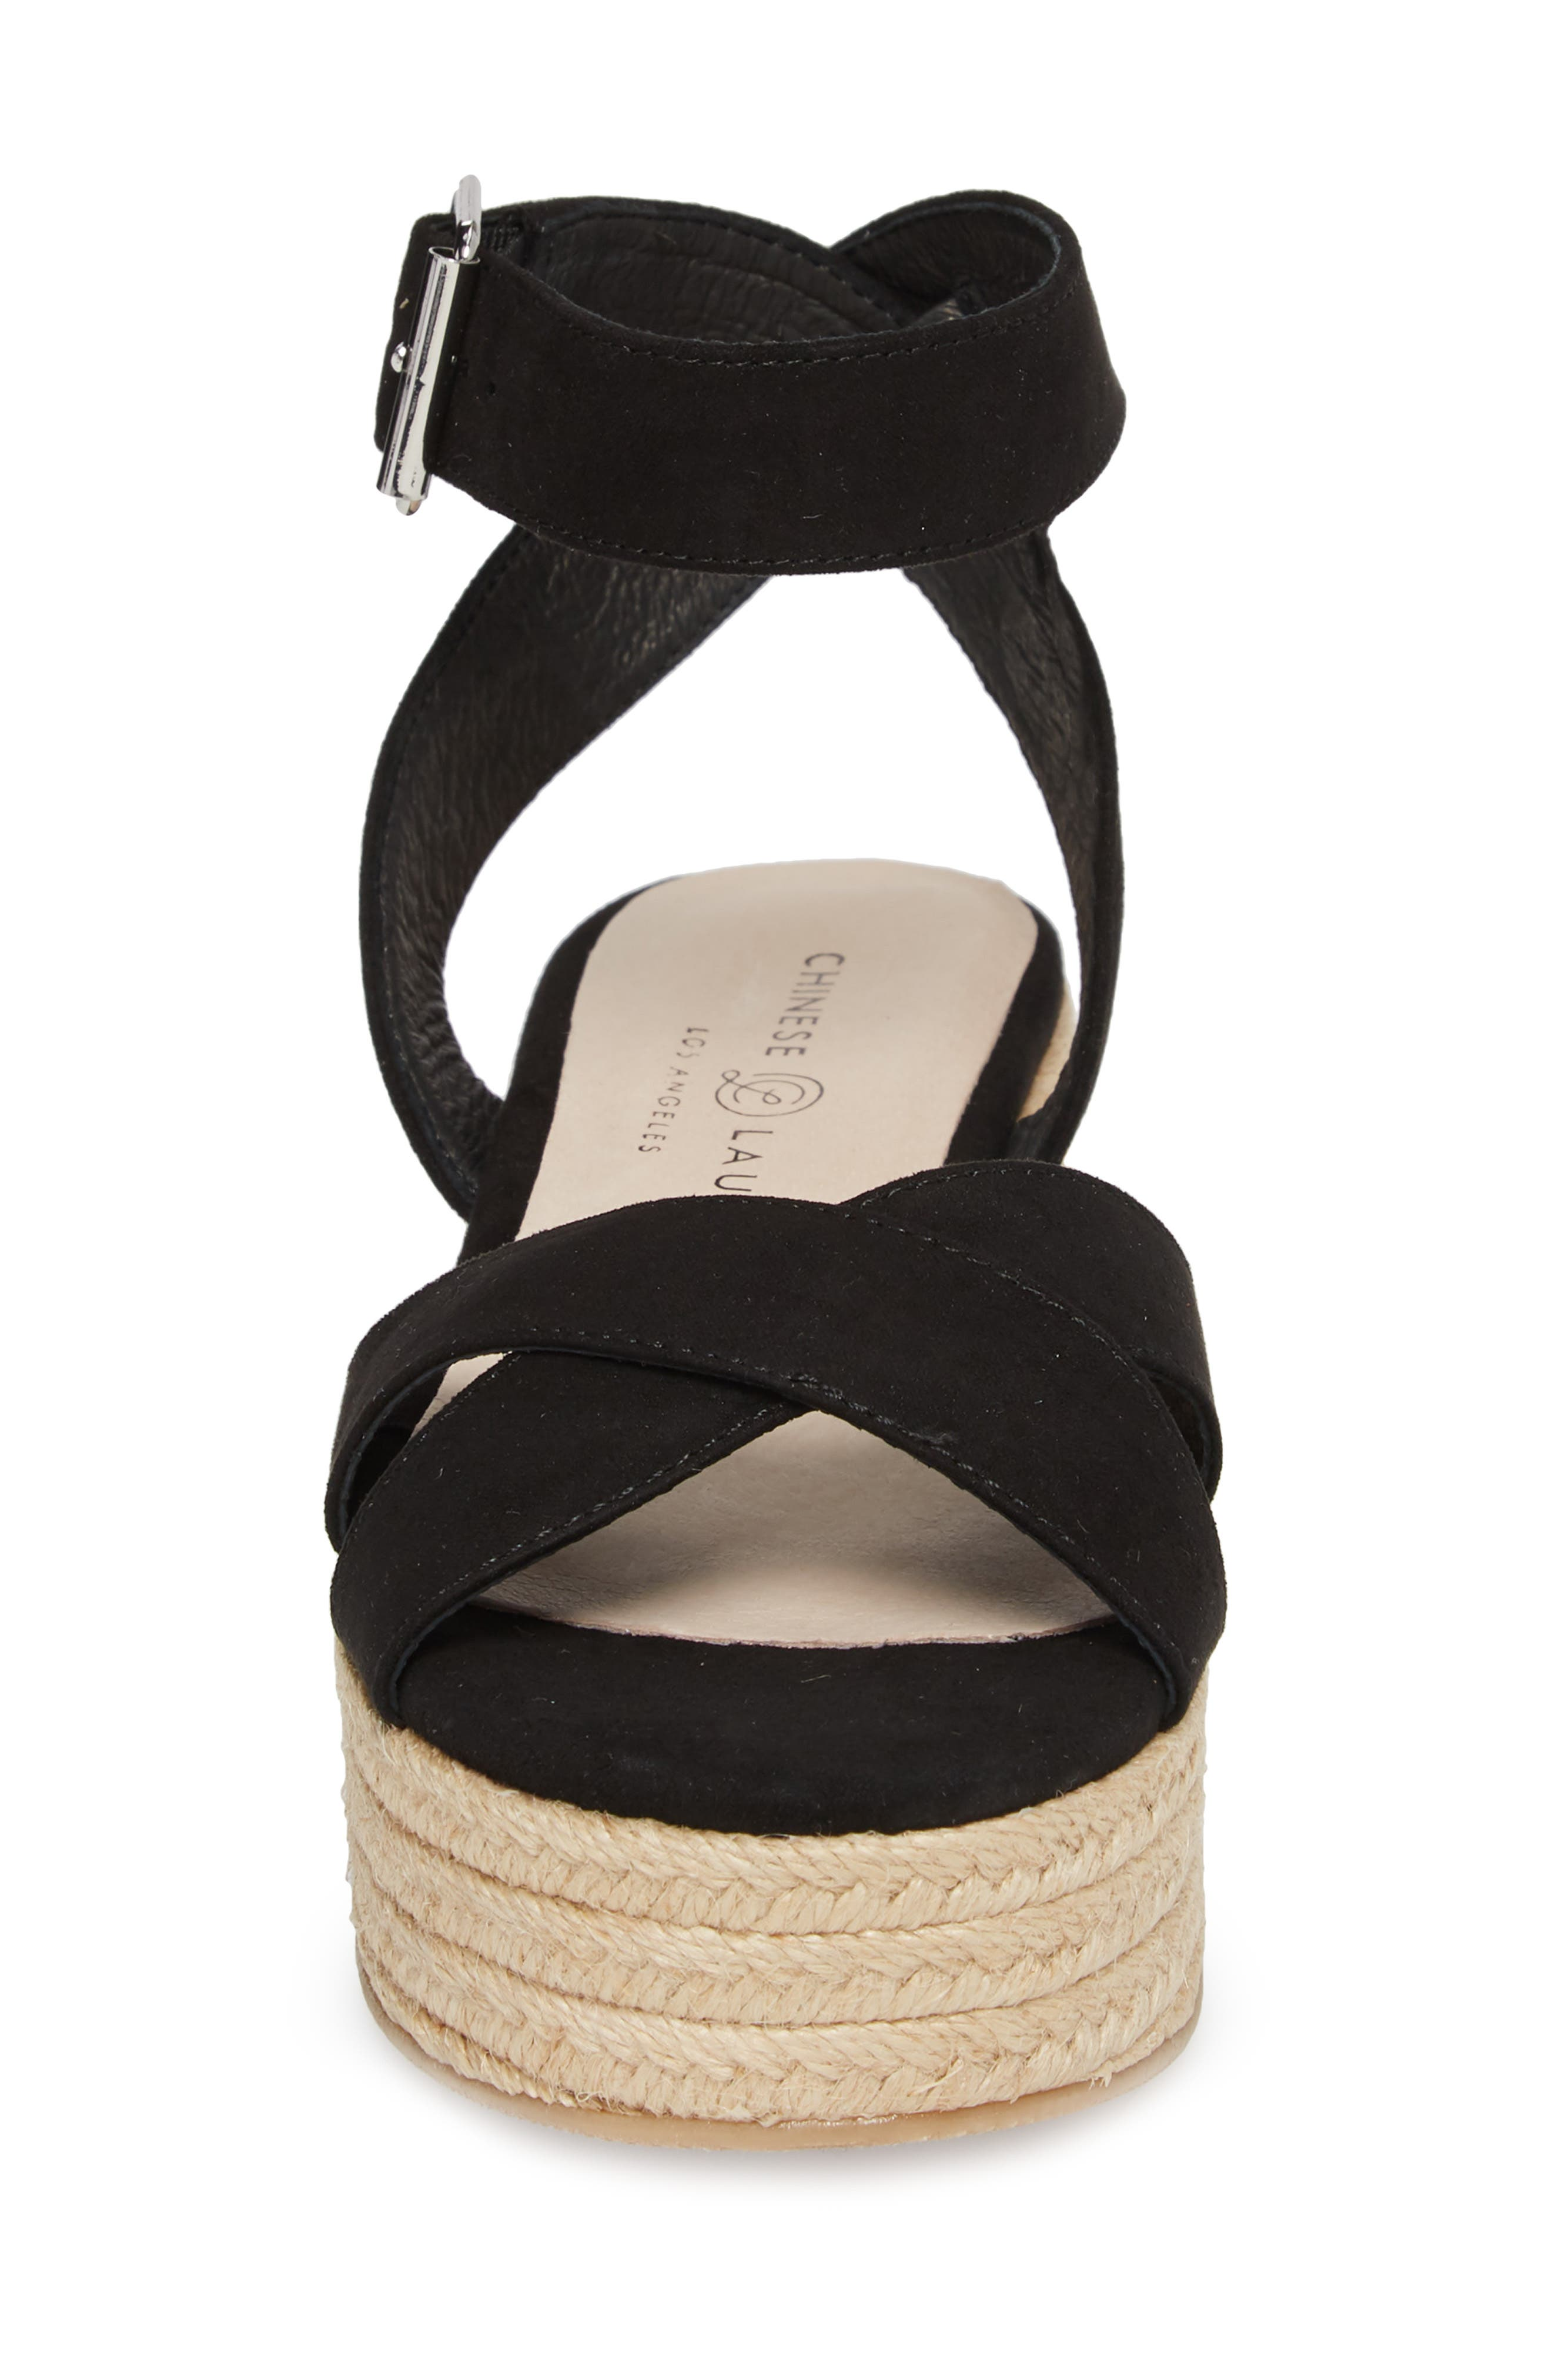 CHINESE LAUNDRY, Zala Espadrille Platform Sandal, Alternate thumbnail 4, color, BLACK